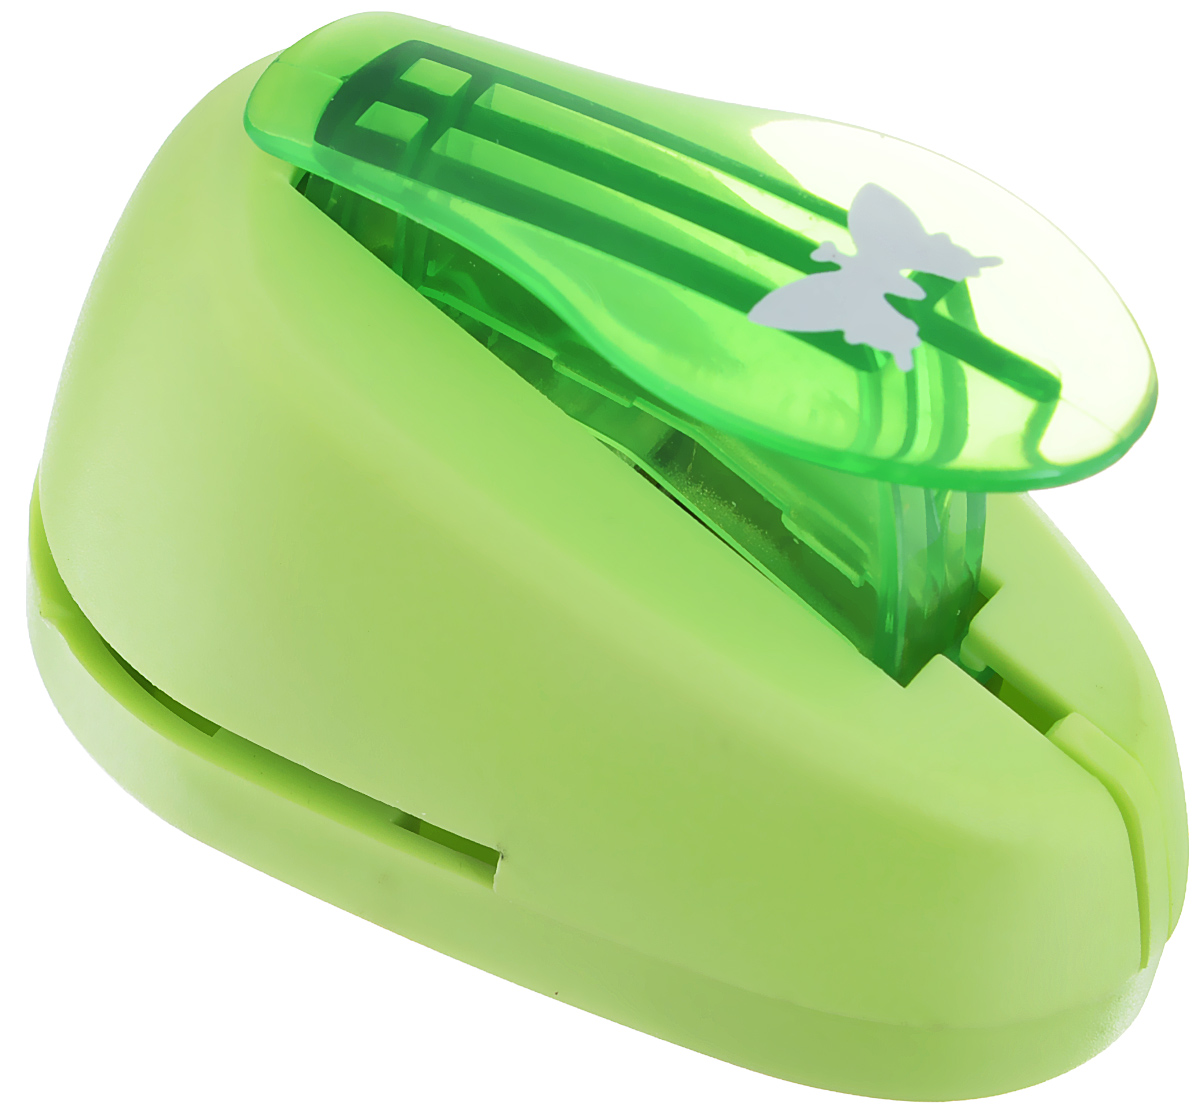 Дырокол фигурный Hobbyboom  Бабочка , №31, цвет: зеленый, 1,8 см -  Степлеры, дыроколы